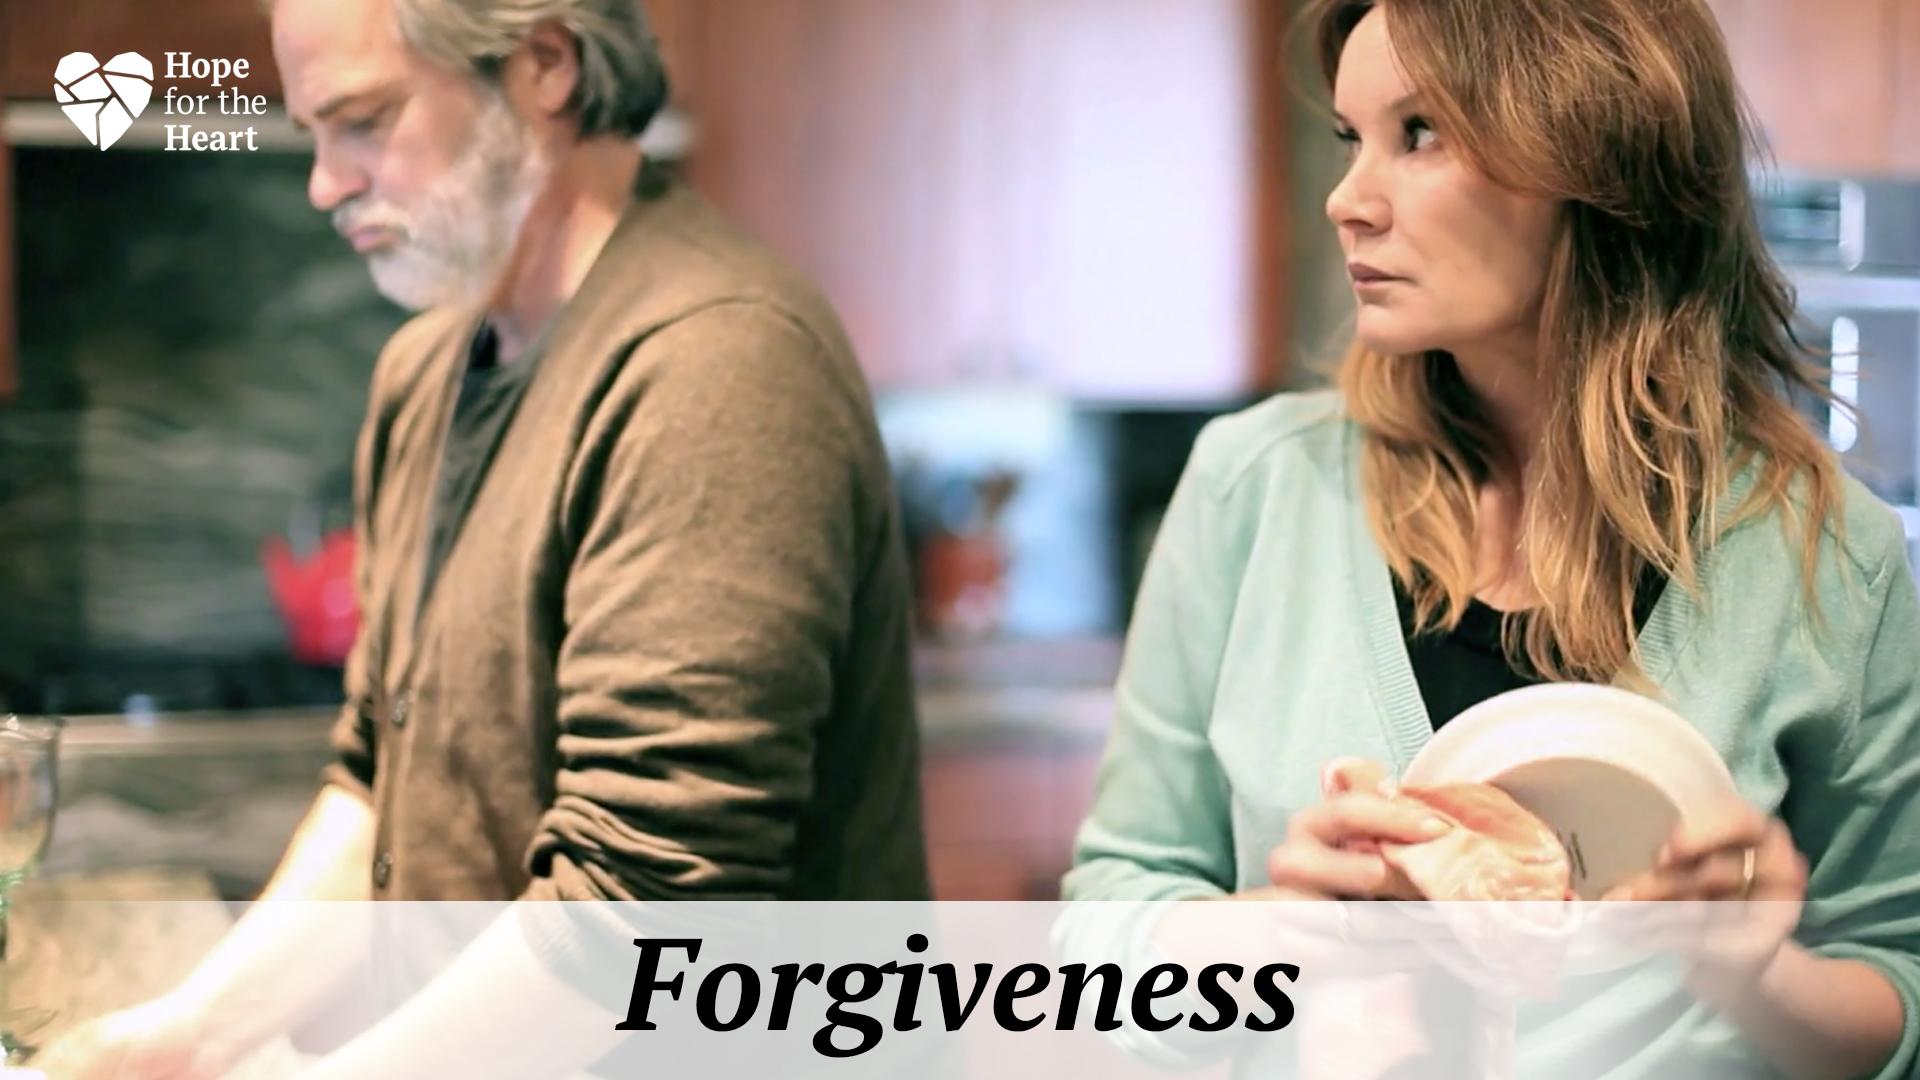 The Choice to Forgive